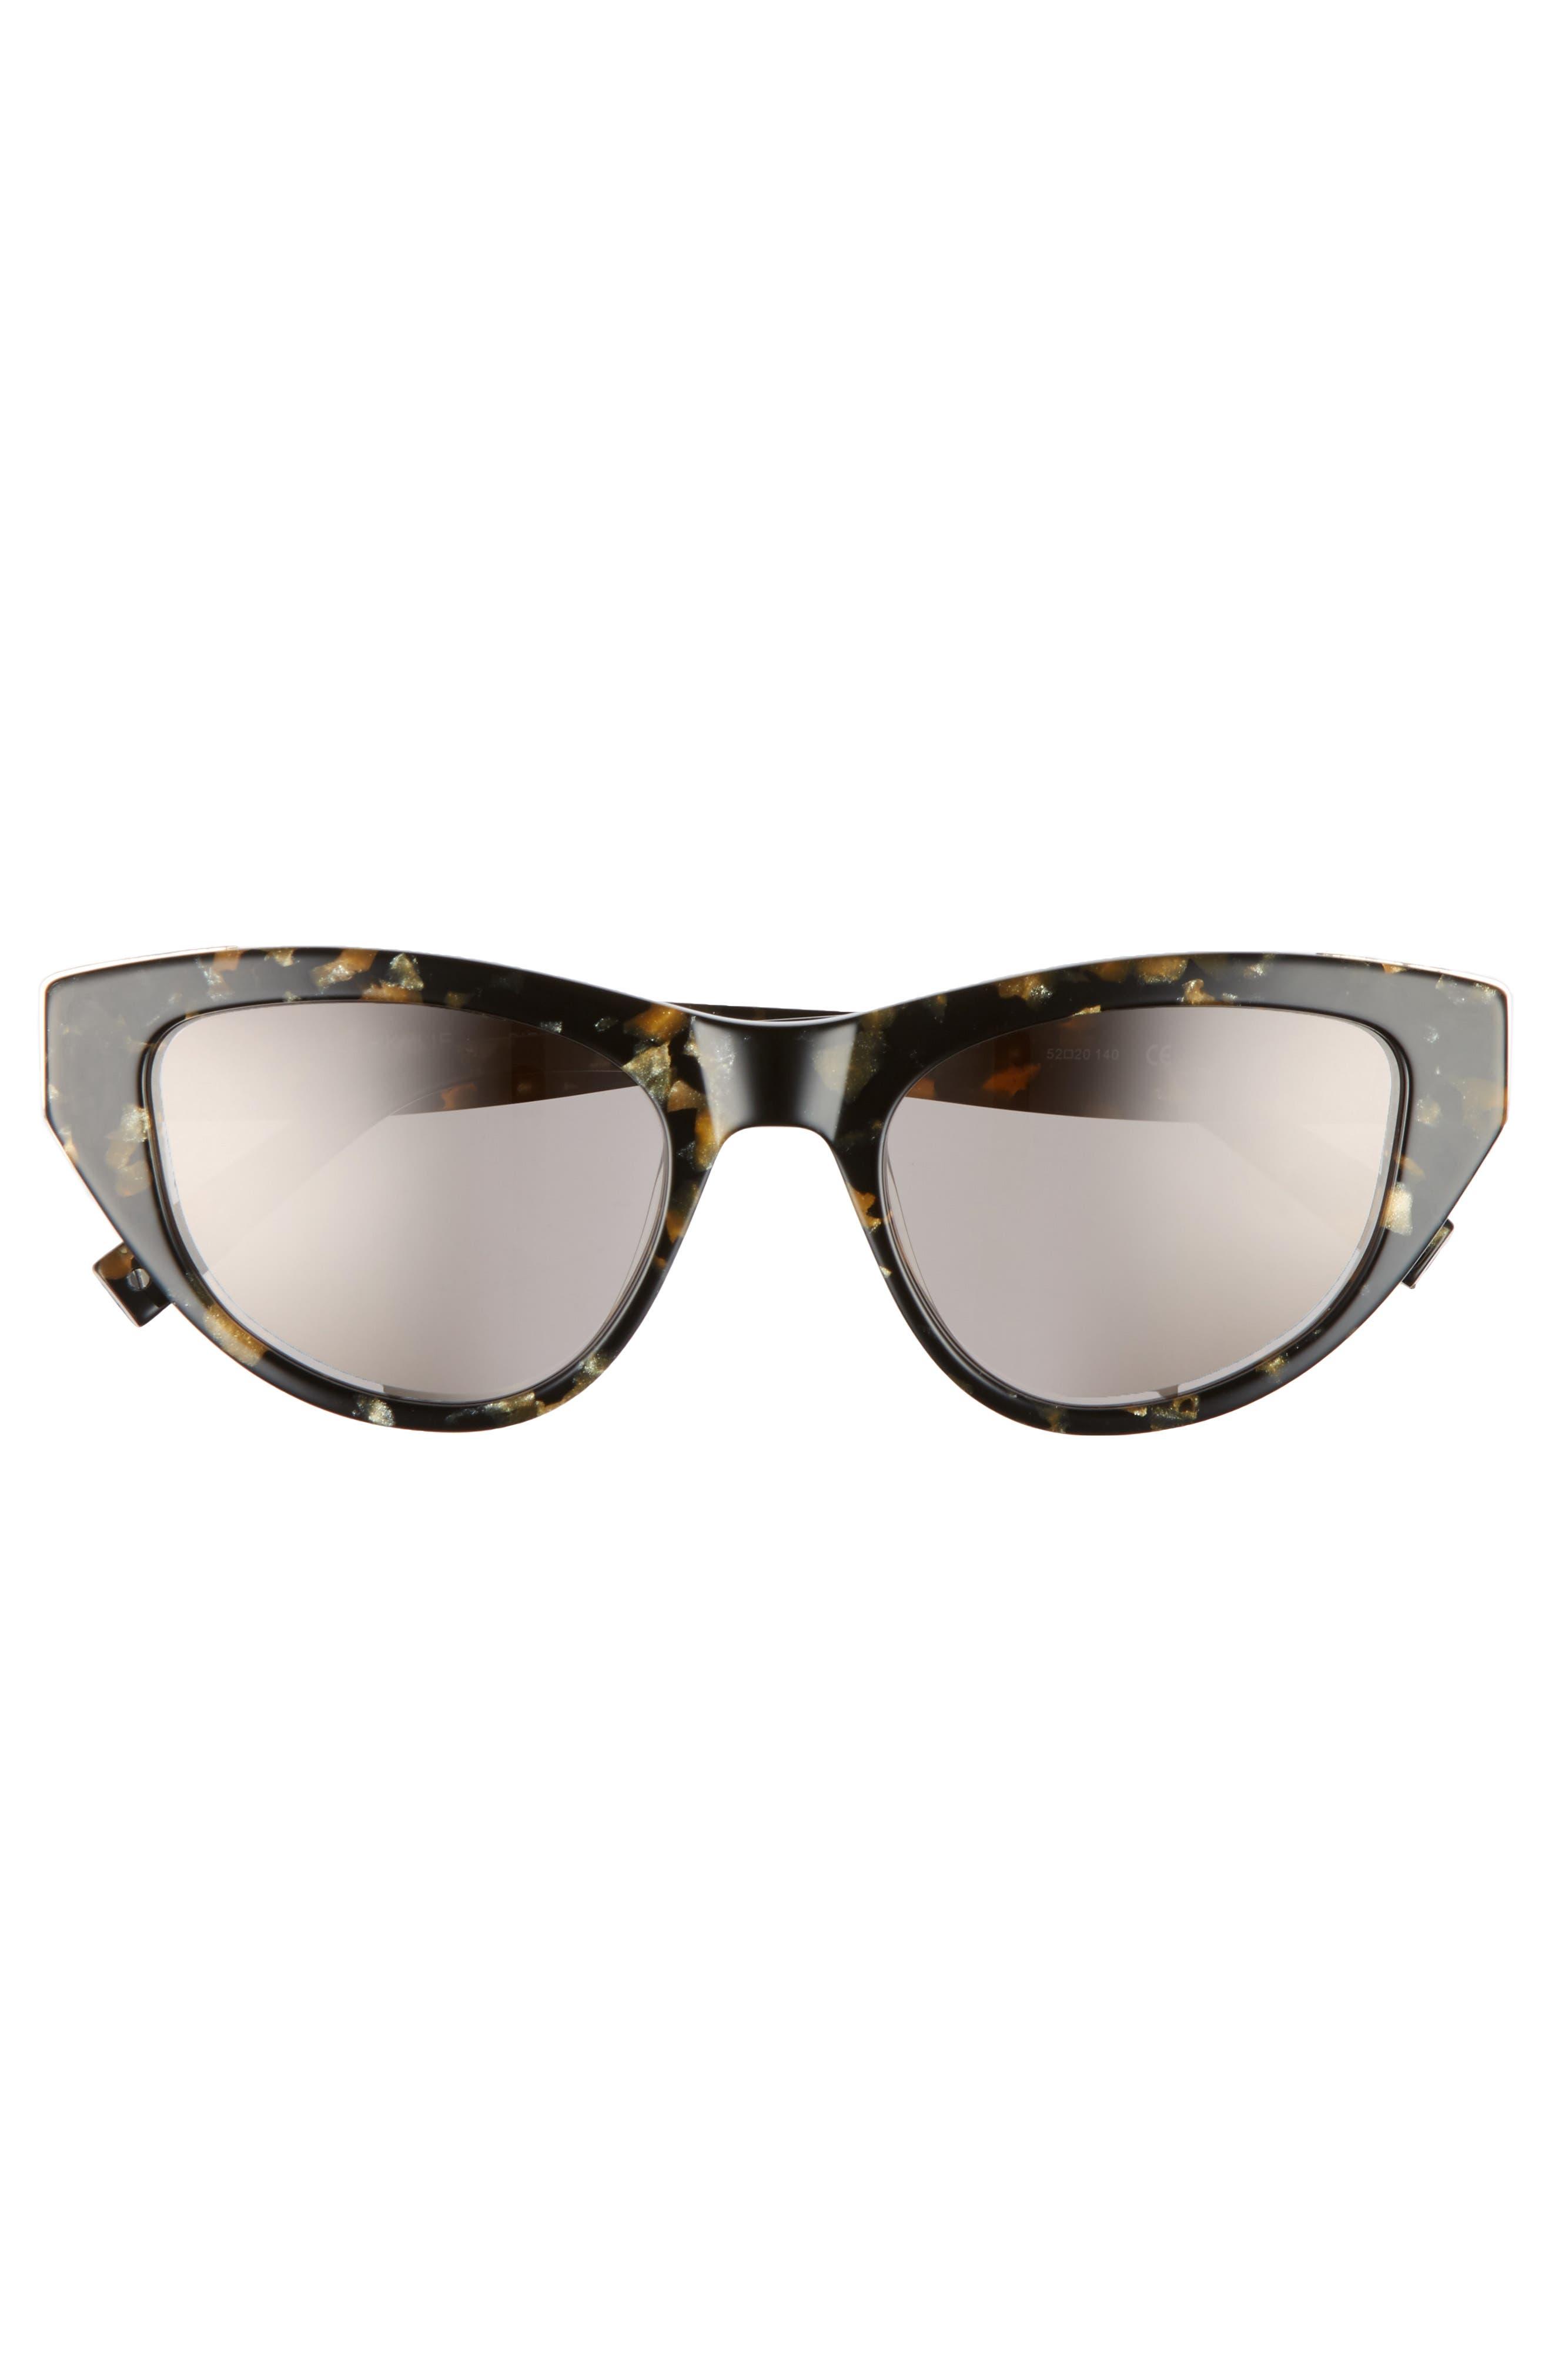 Sienna 52mm Retro Cat Eye Sunglasses,                             Alternate thumbnail 7, color,